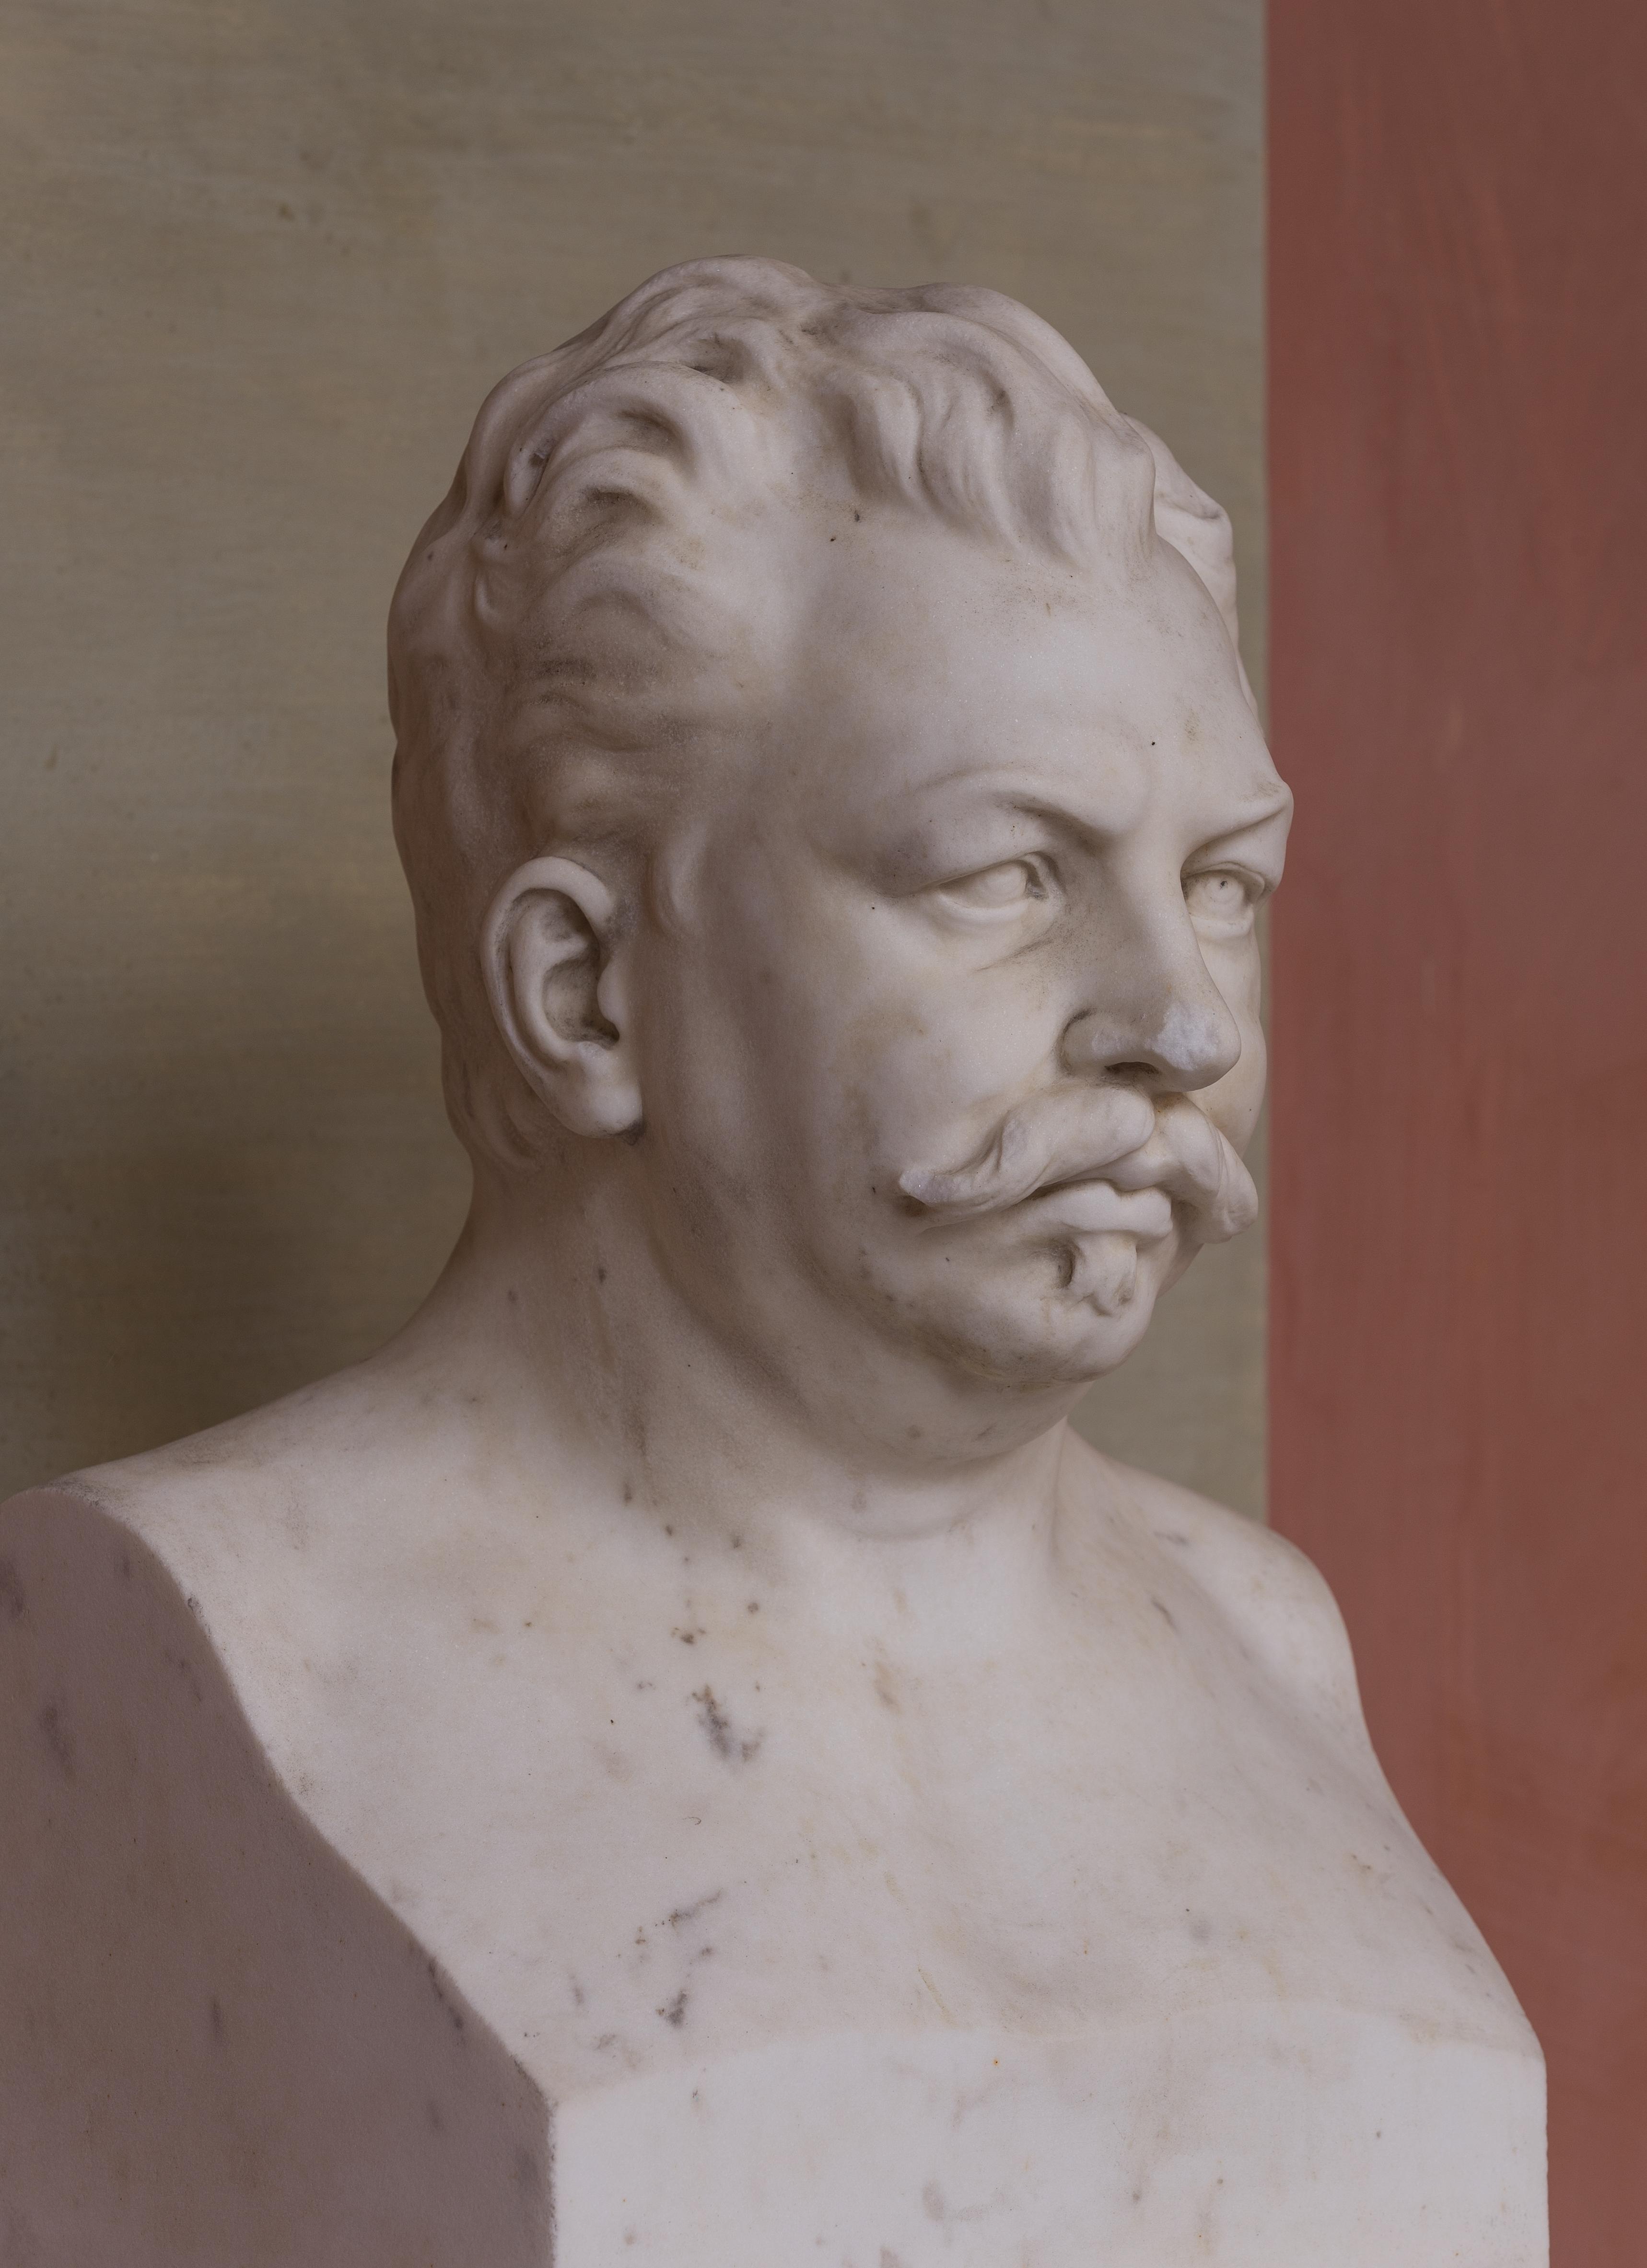 Image of Robert Ultzmann from Wikidata